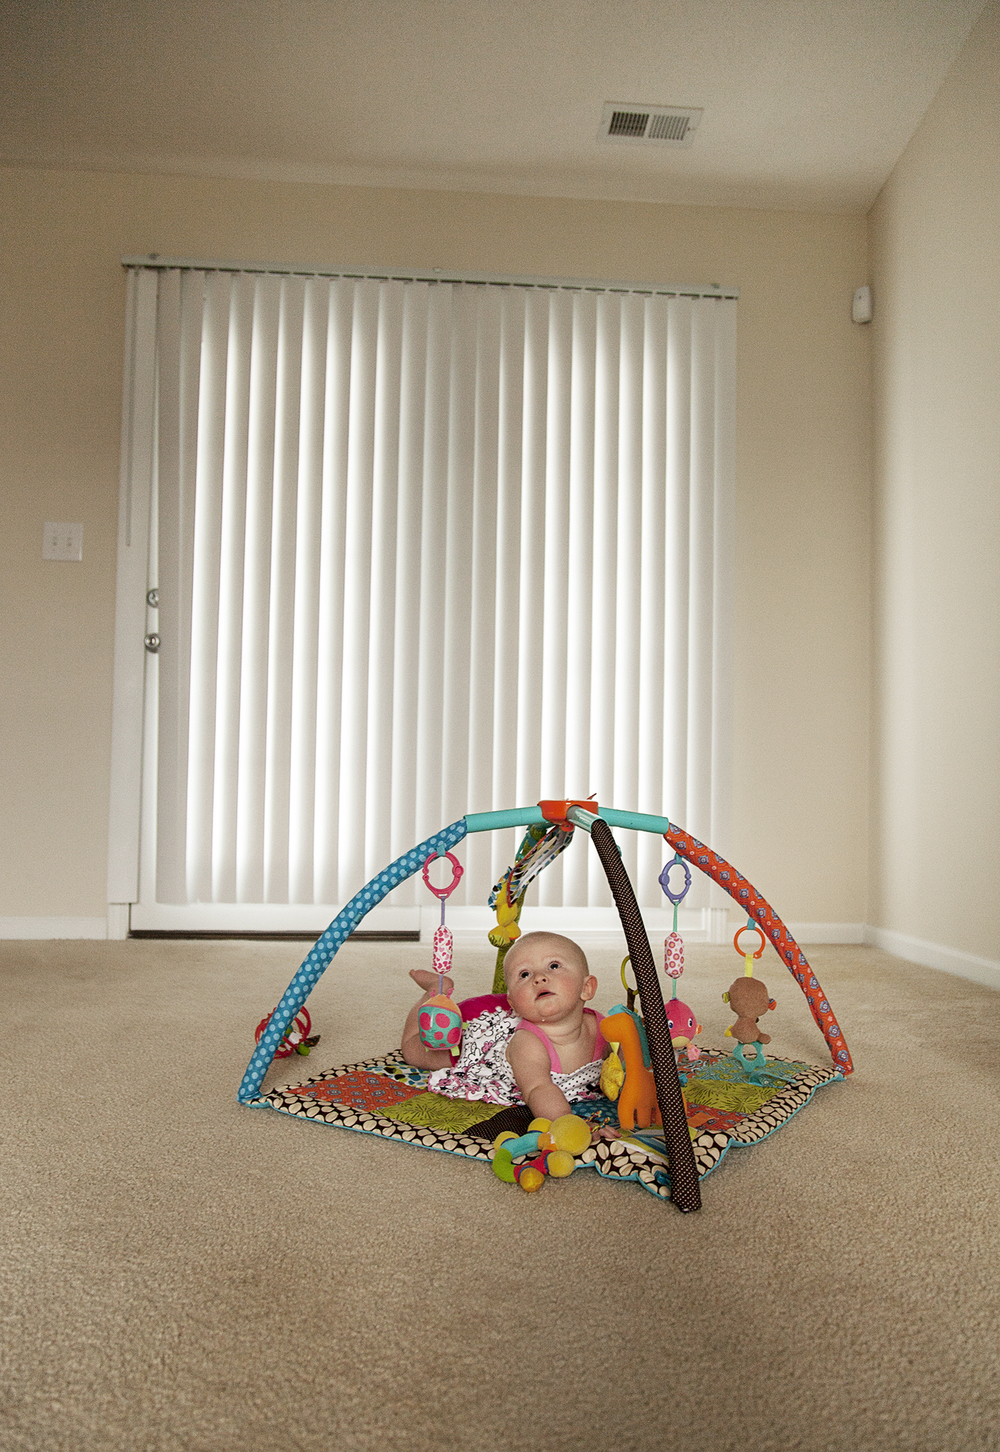 BabyintheHouseofBlinds_Web.jpg